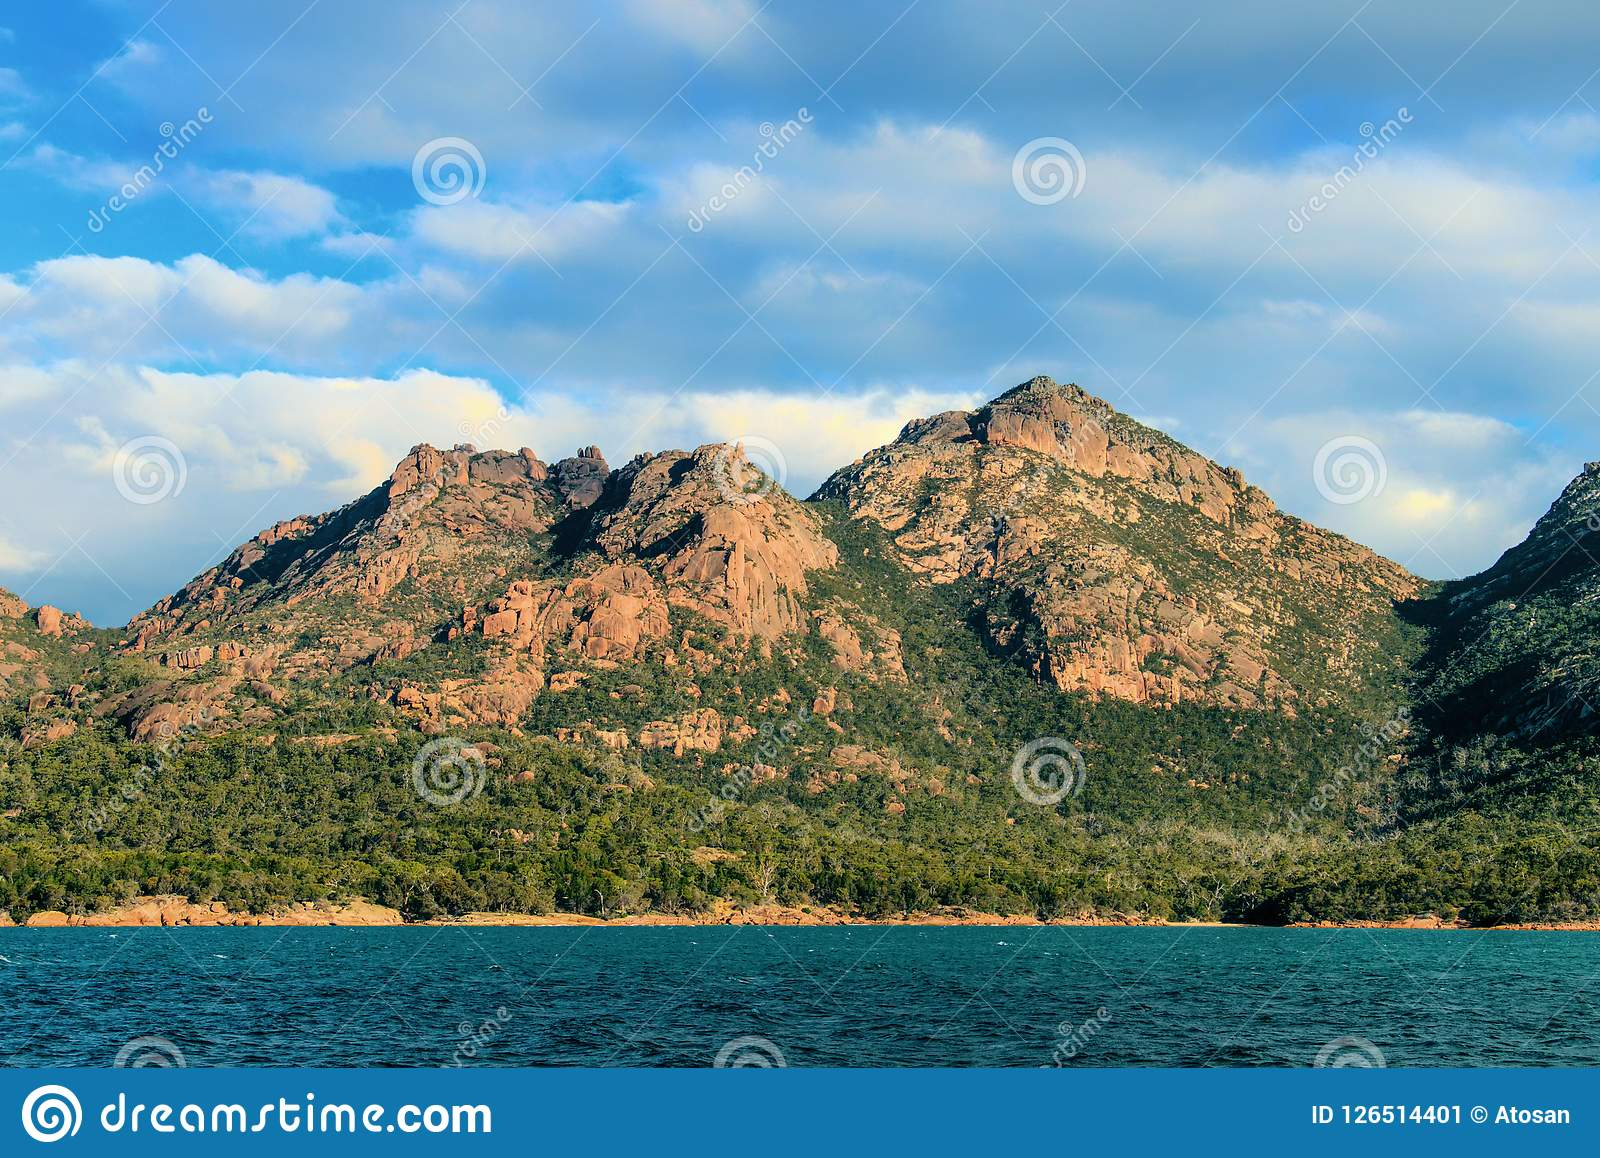 Costa leste tasmaniana